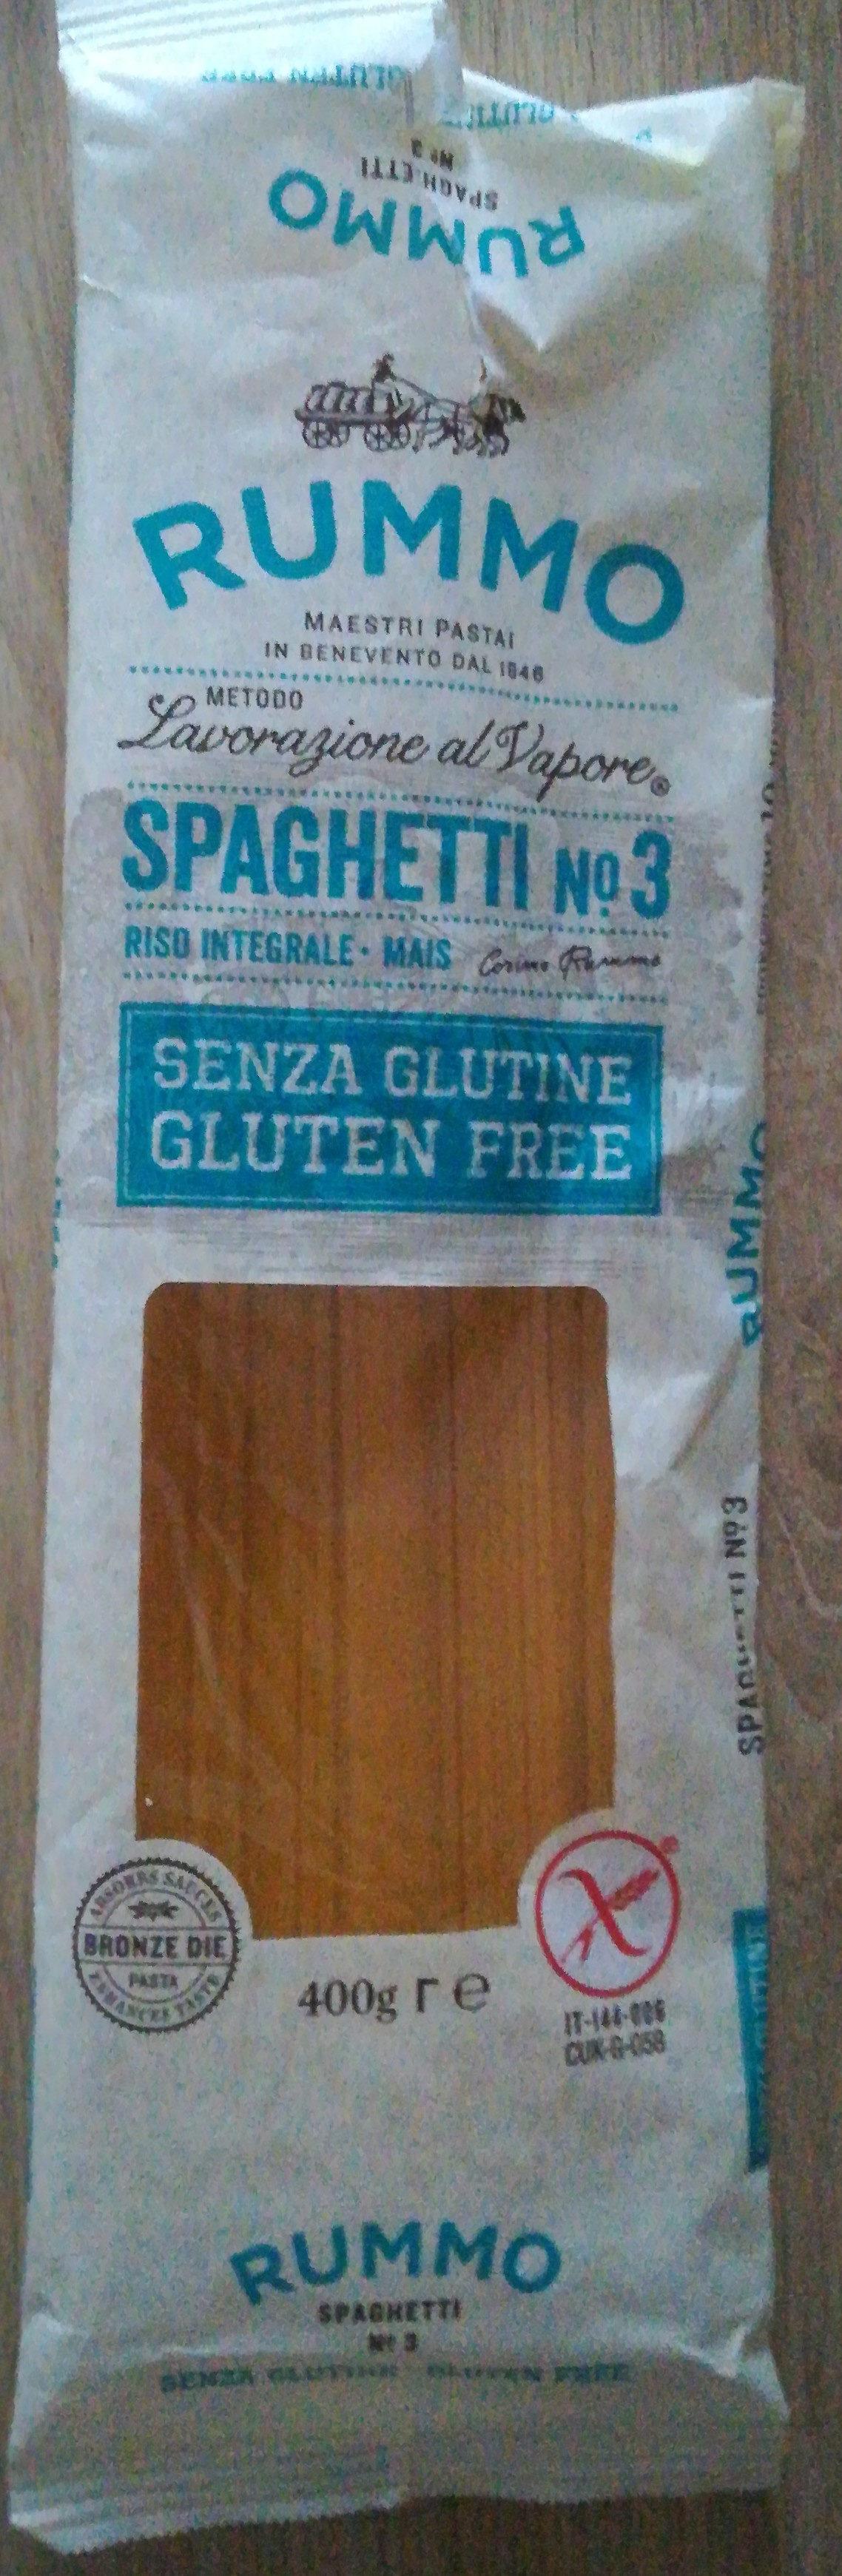 Spaghetti gluten free - Product - fr